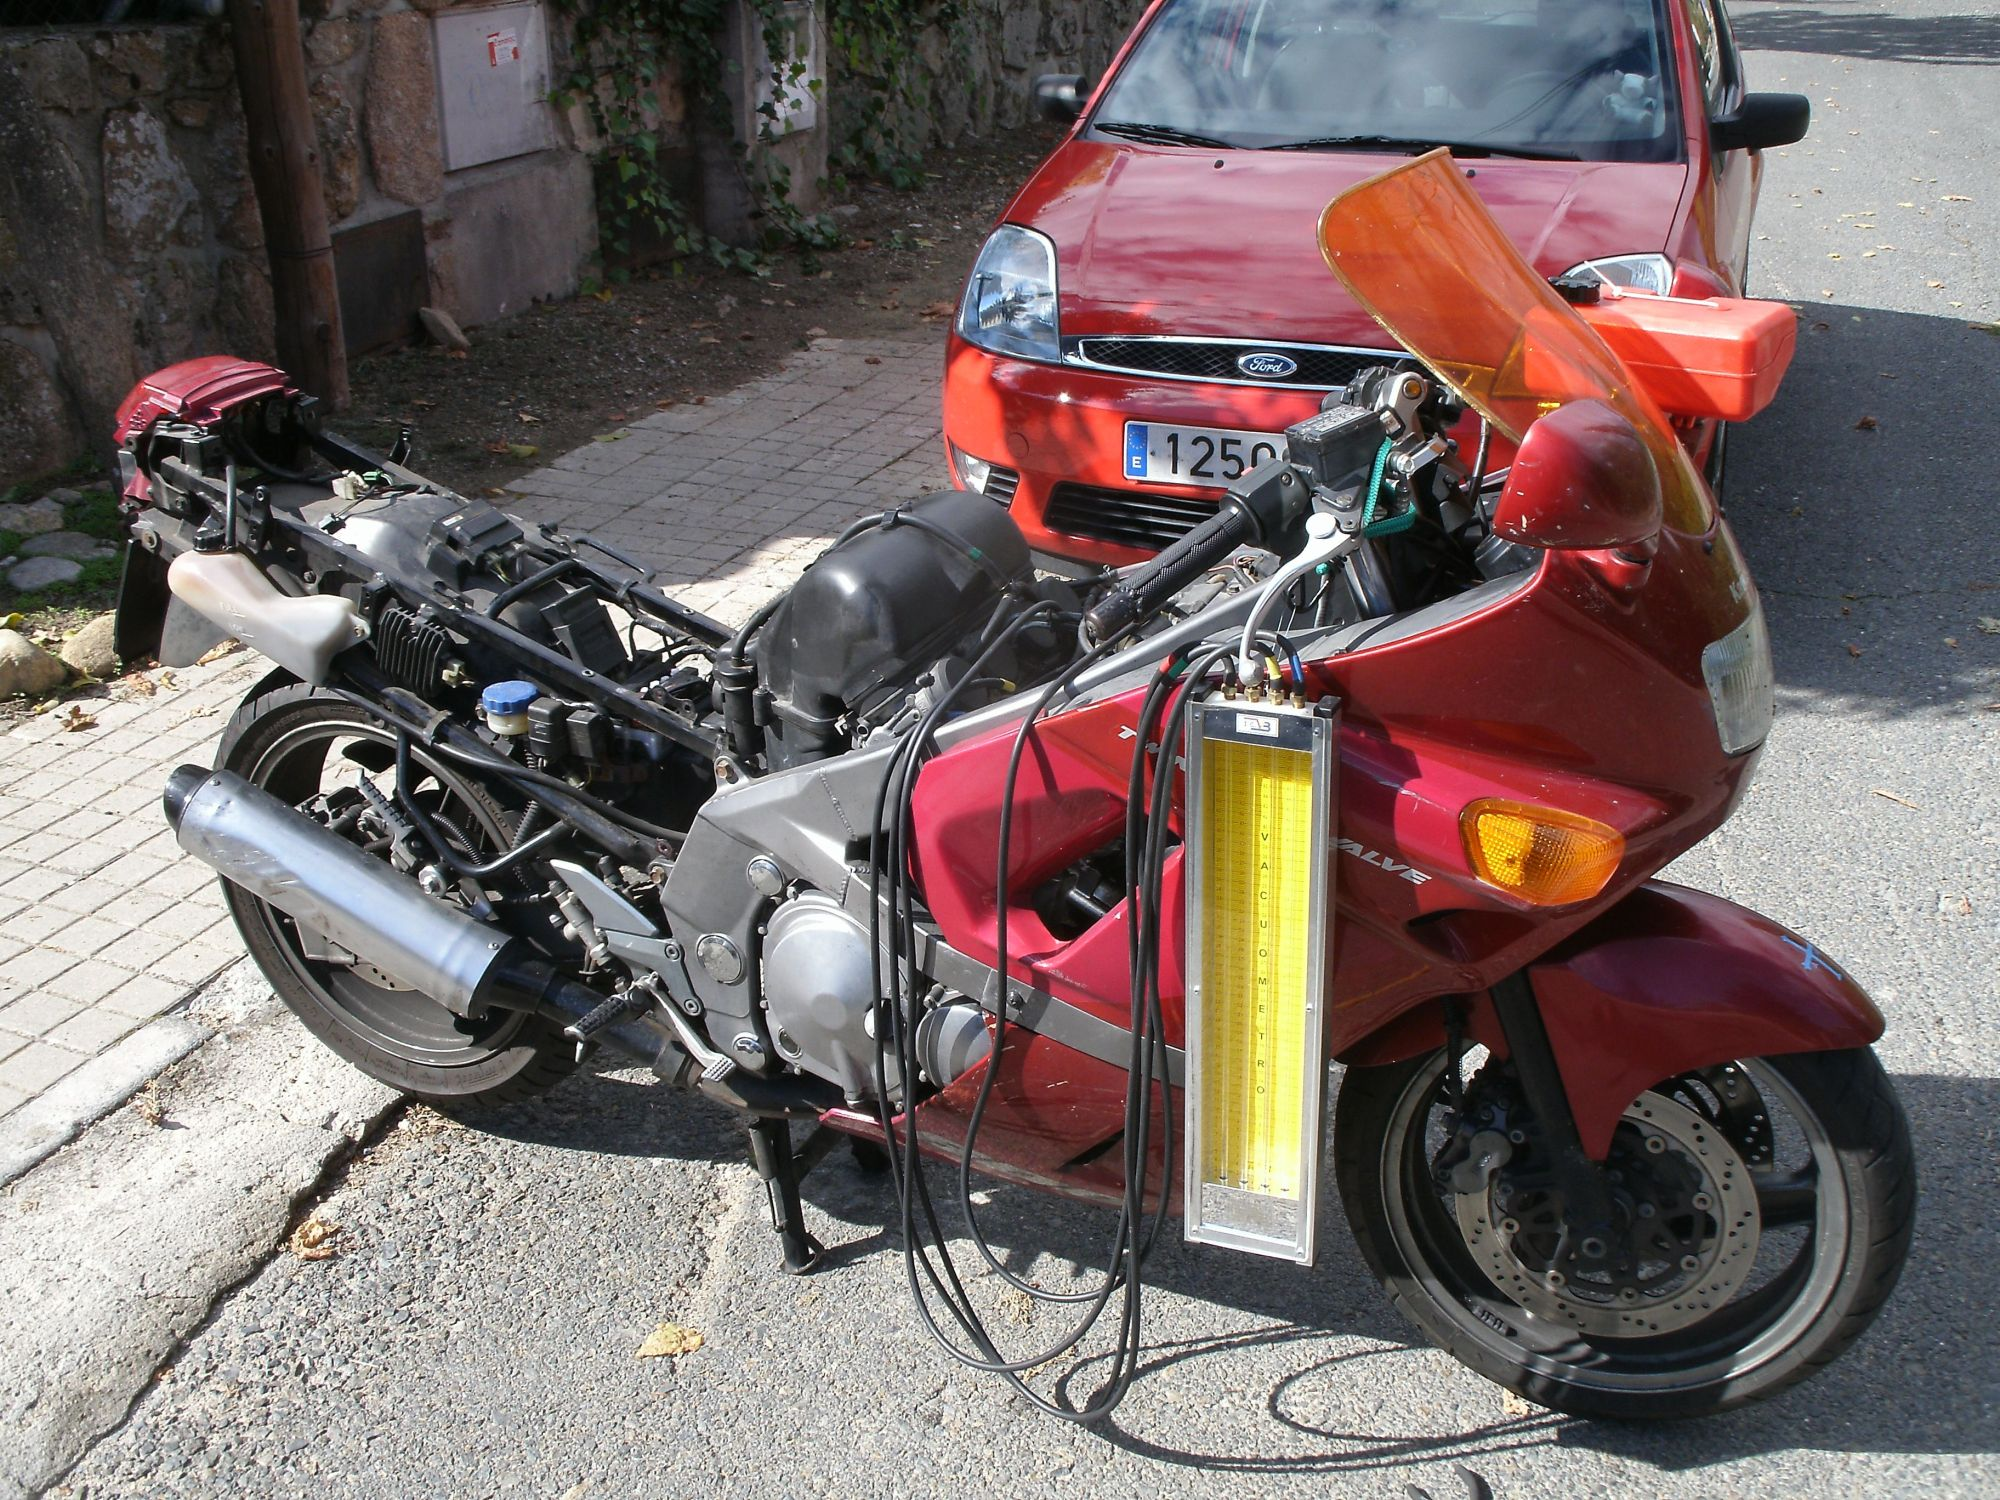 hight resolution of 2006 kawasaki zzr600 wiring diagram honda cbr600f3 wiring diagram wiring diagram